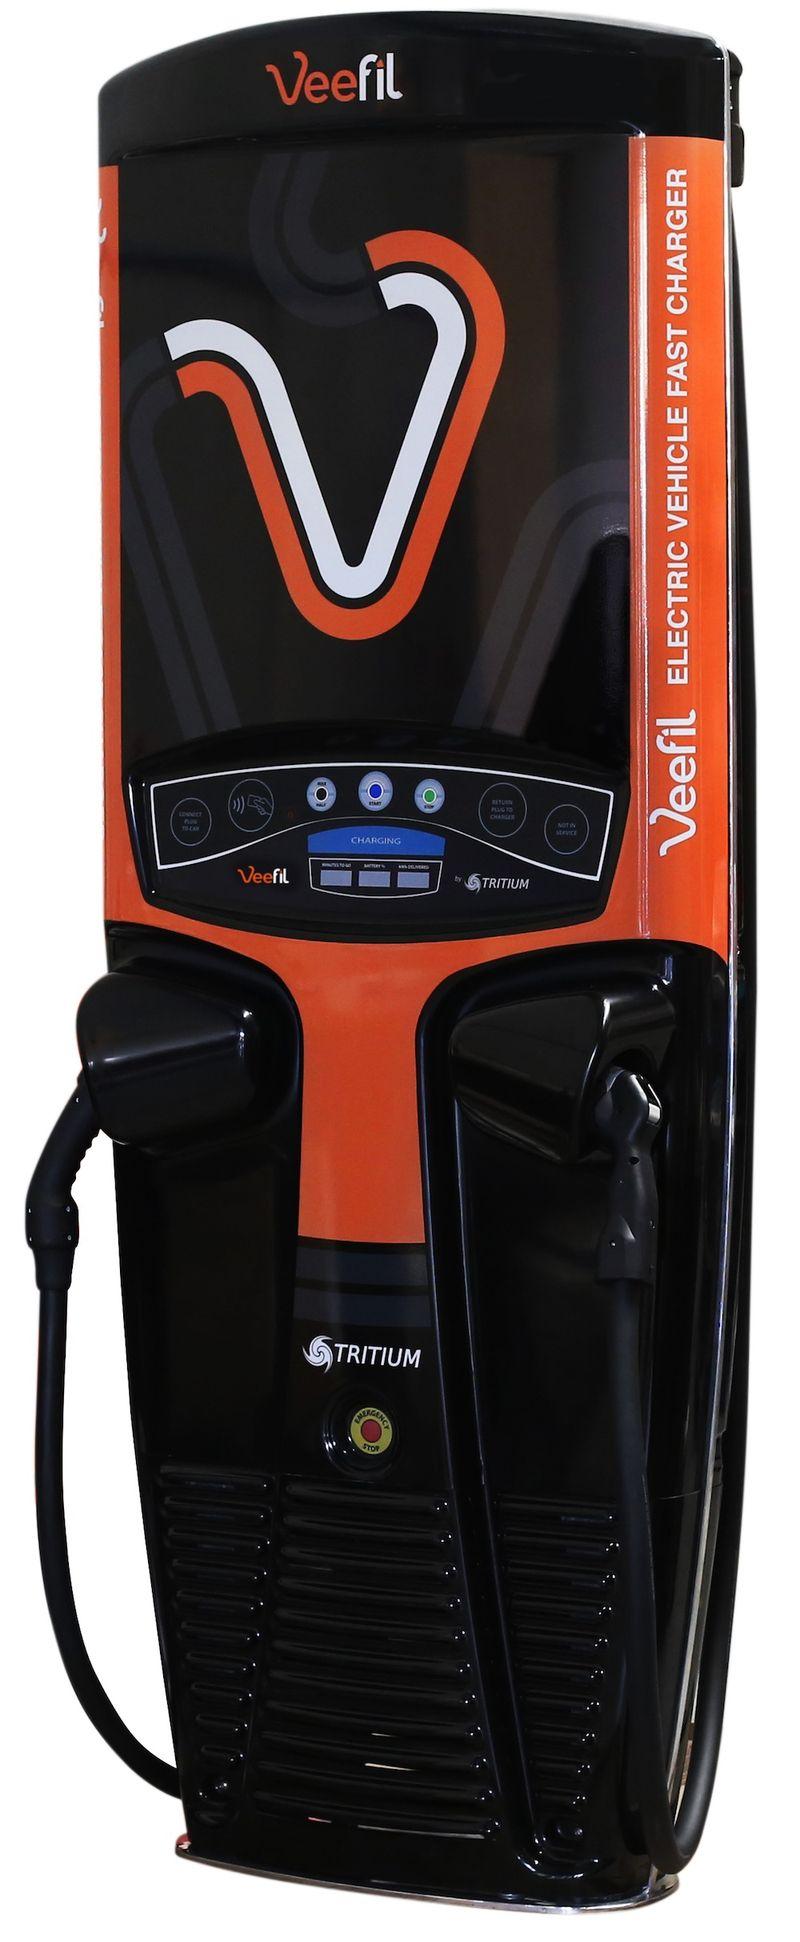 veefil-ev-charger